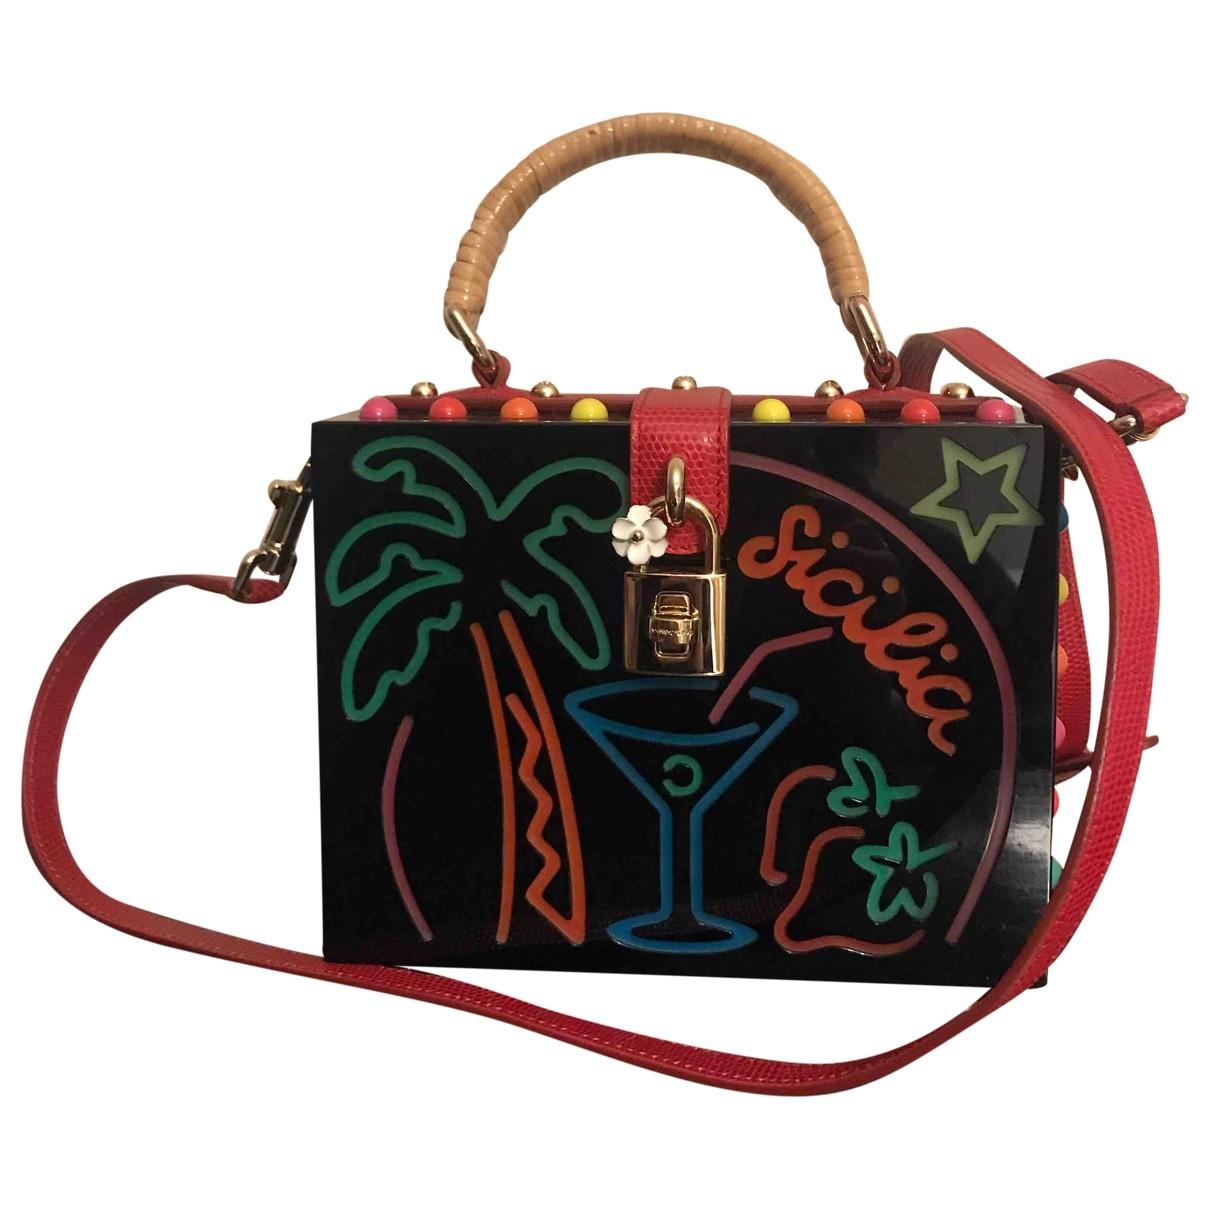 Dolce & Gabbana \N Black handbag for Women \N